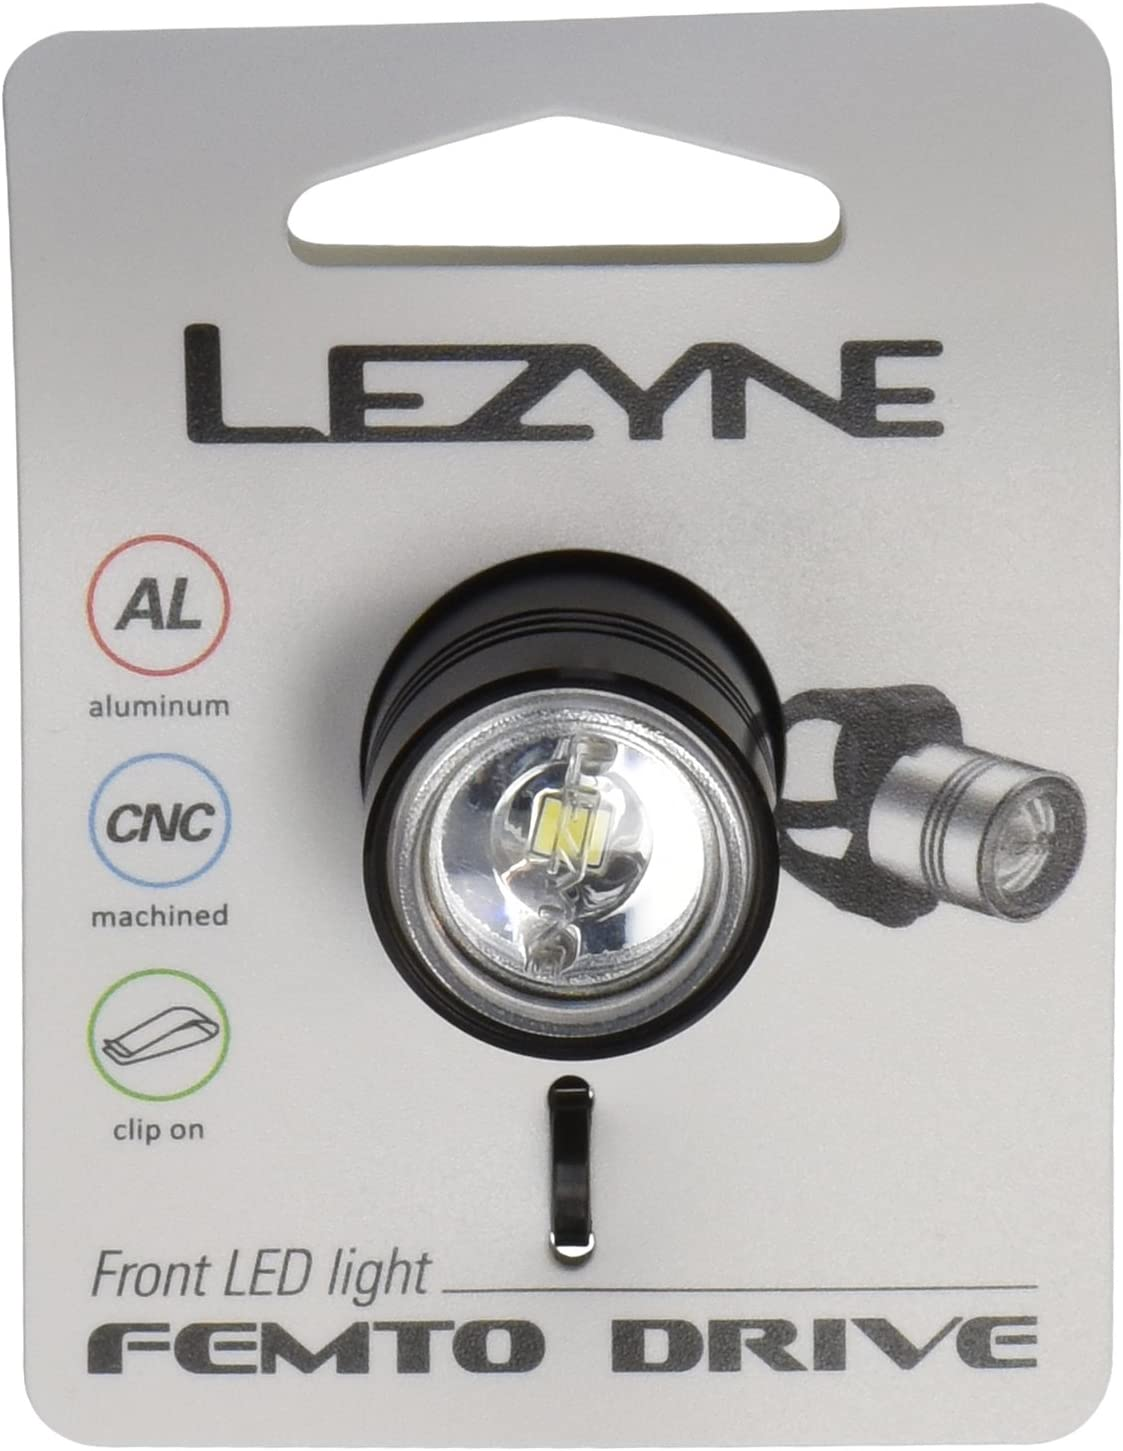 Matte Black Lezyne Femto USB Drive Pair LED Cycle Light Front Rear